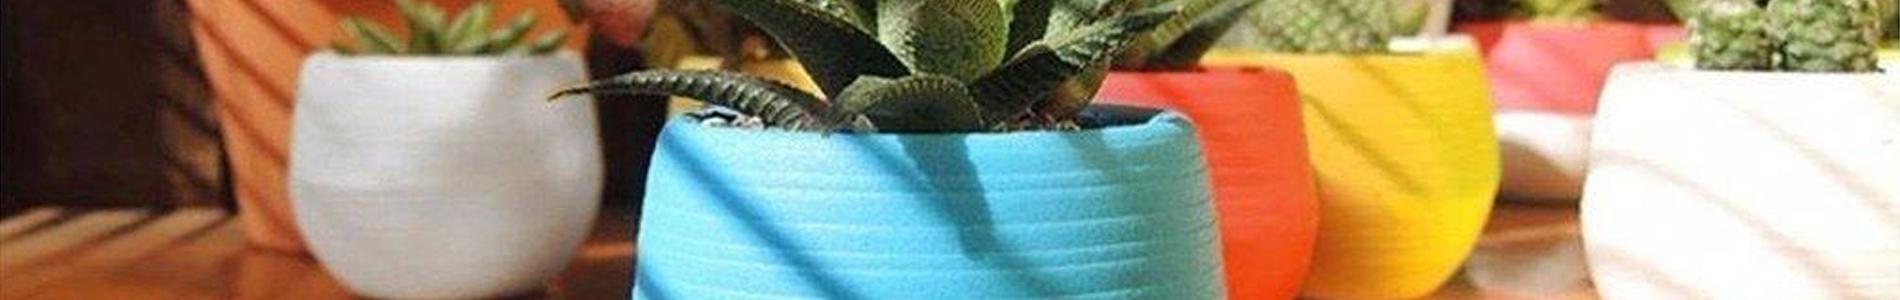 Plant Care, Soil & Accessories